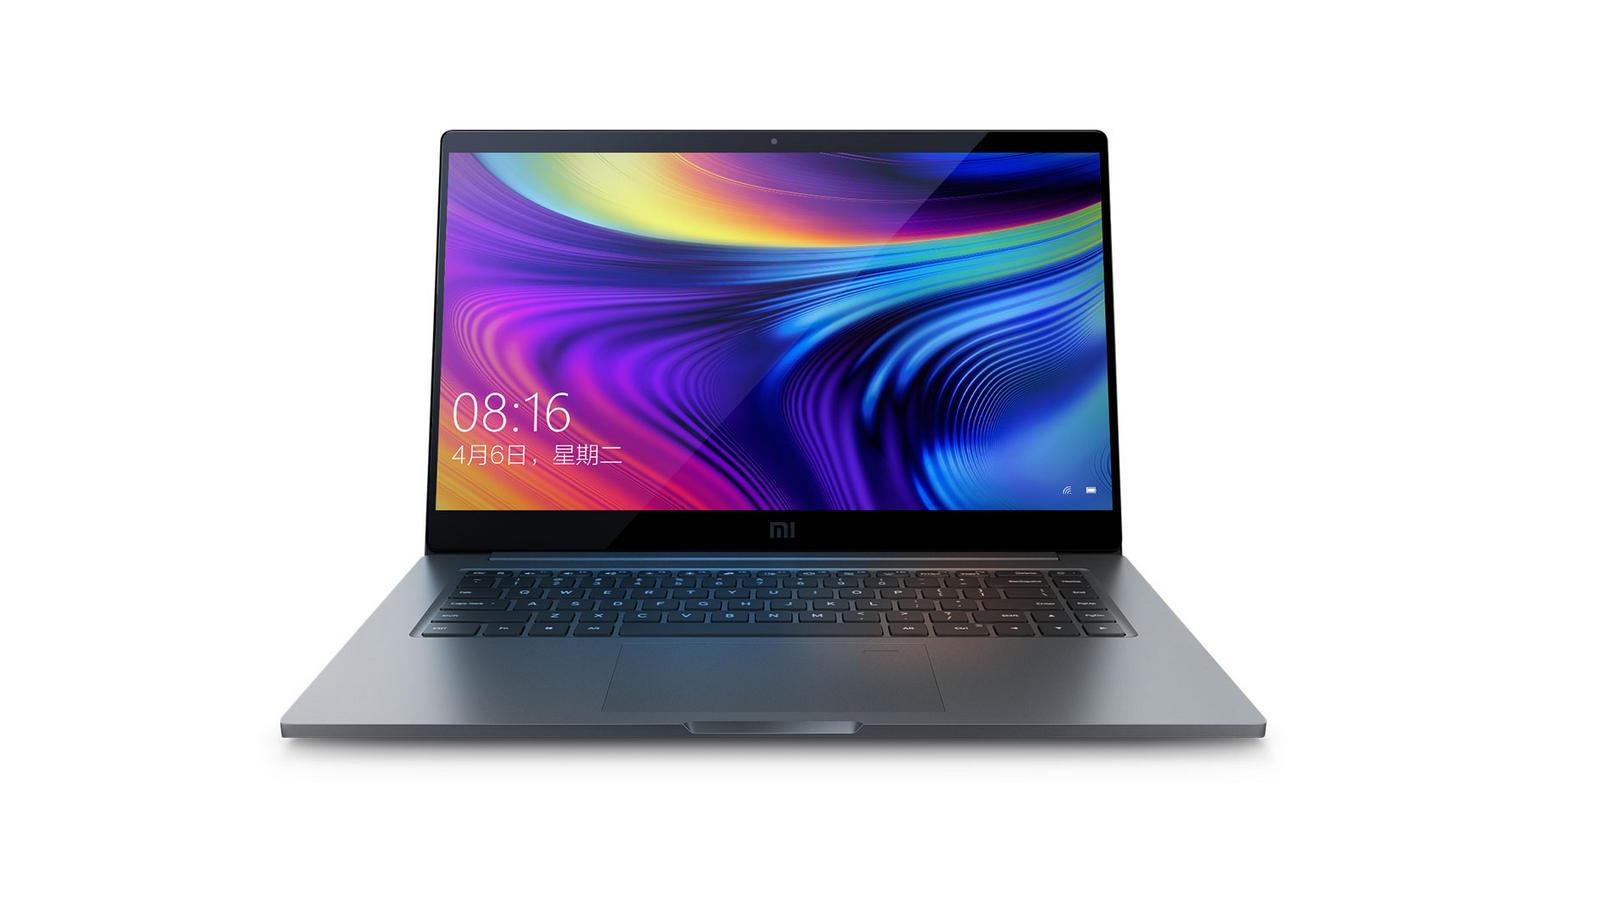 Xiaomi Mi Notebook Pro 15 2020 - Banggood